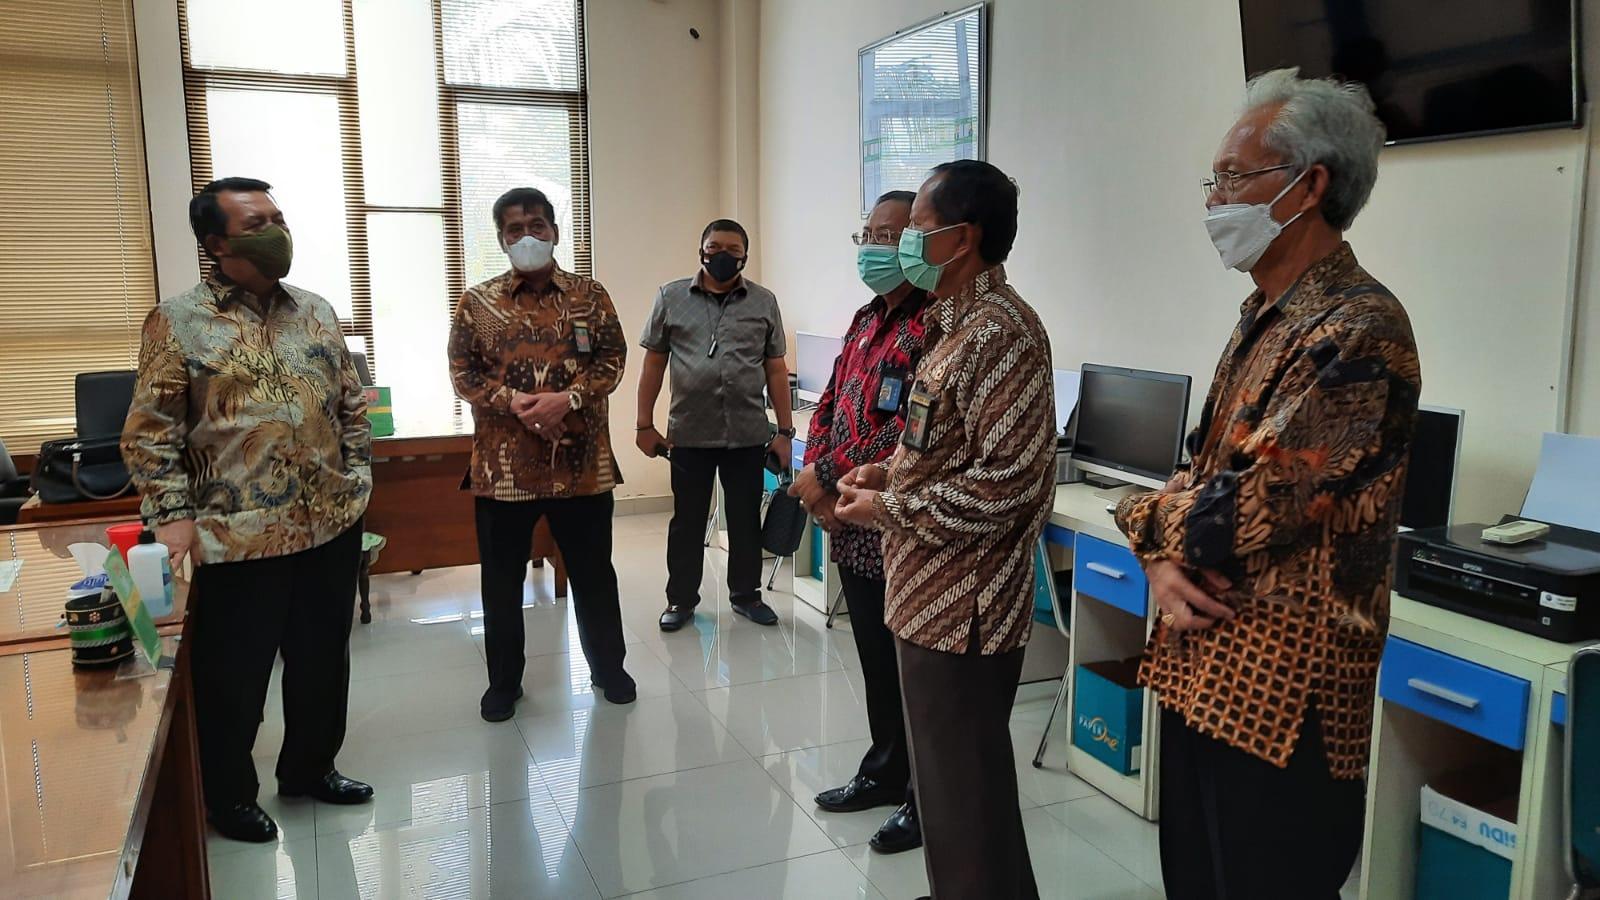 Kunjungi Pengadilan Di Wates, Ketua MA Mengajak Seluruh Aparatur Untuk Bekerja Dengan Ikhlas